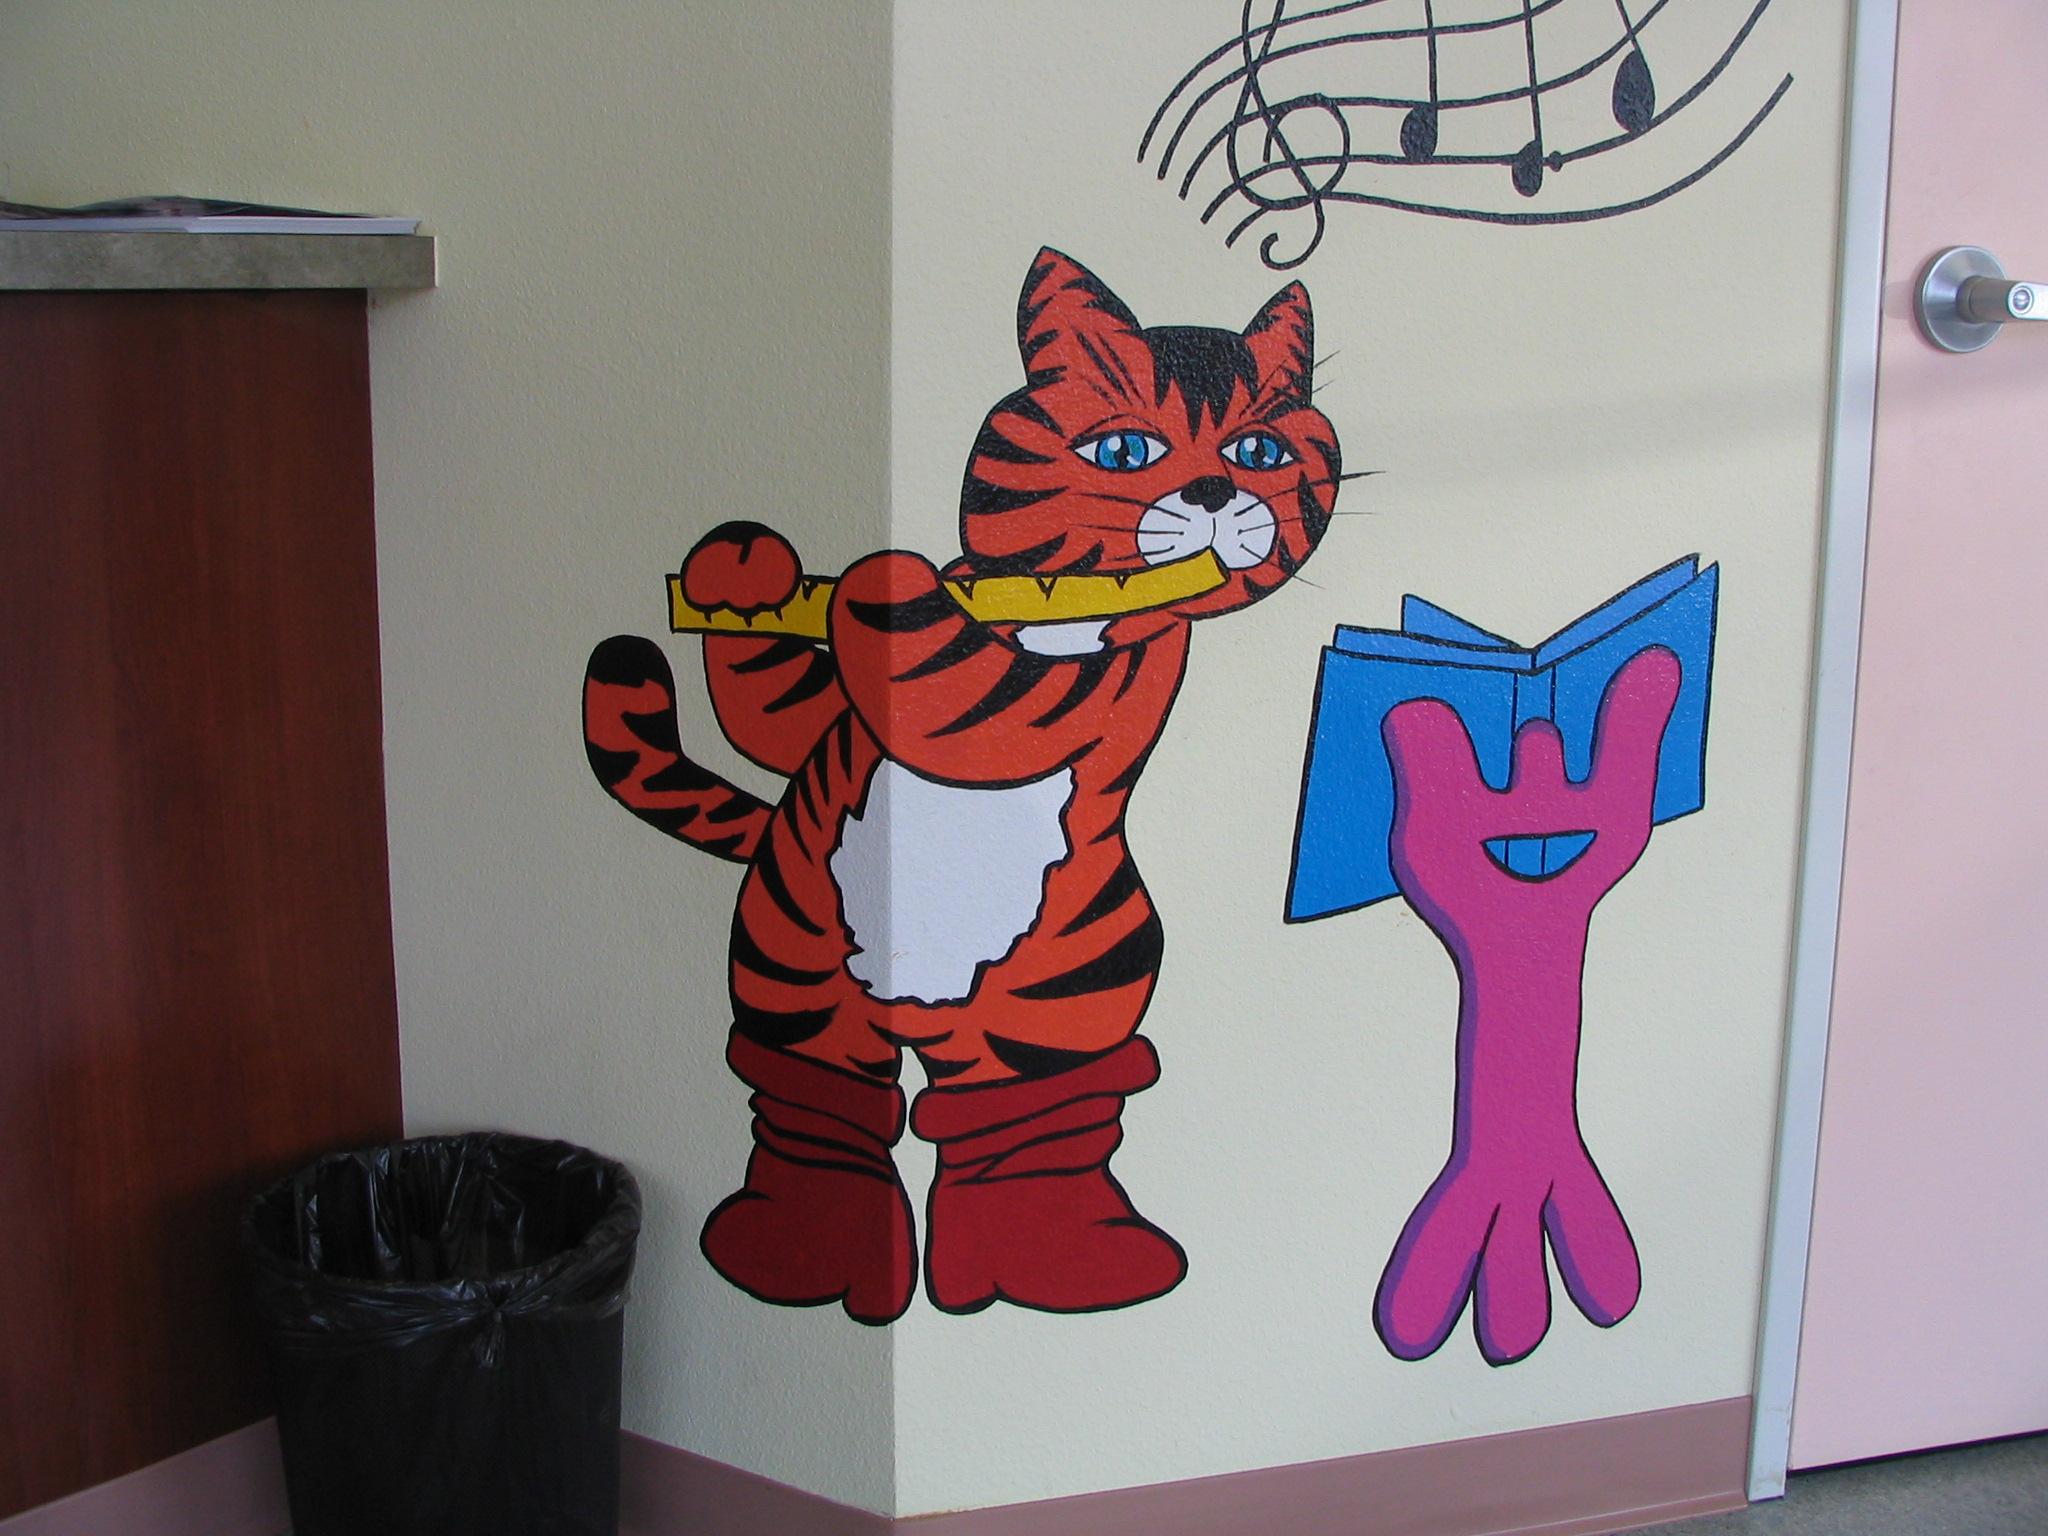 Kids Dental care handpainted Mural created by Paul Maxwell Godfrey